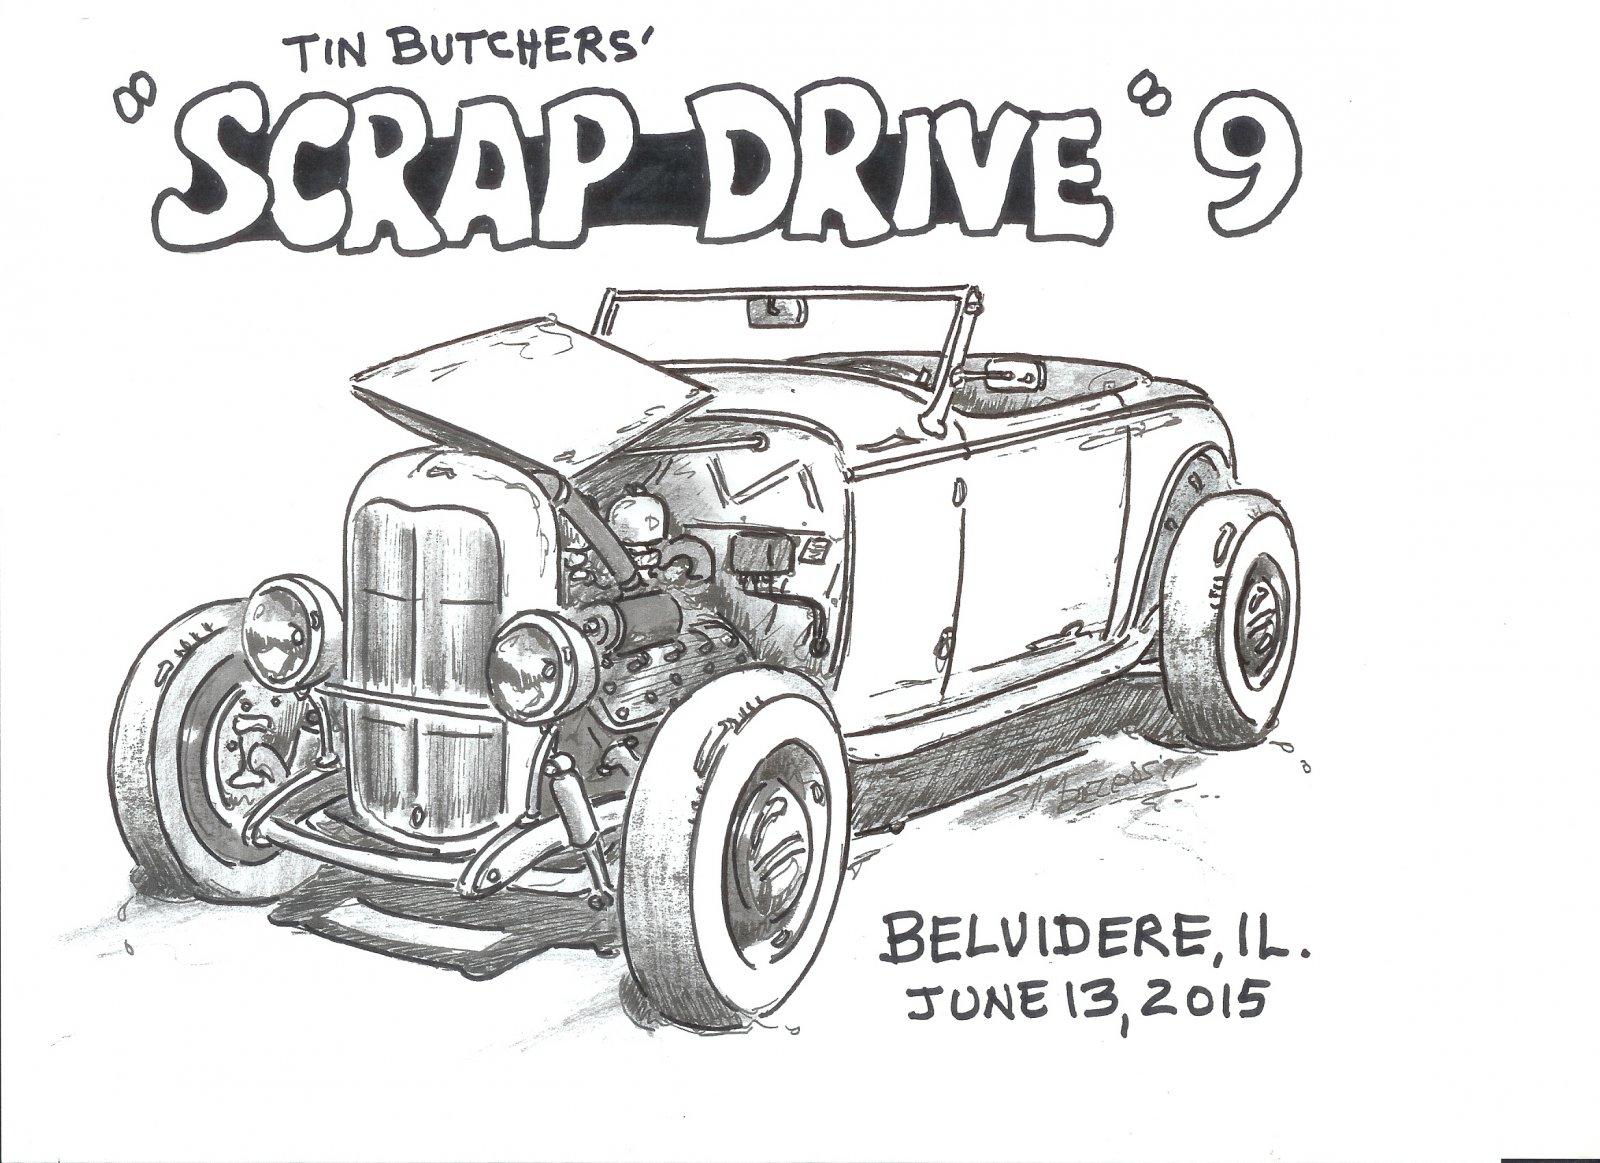 scrap drive design 9 001.jpg